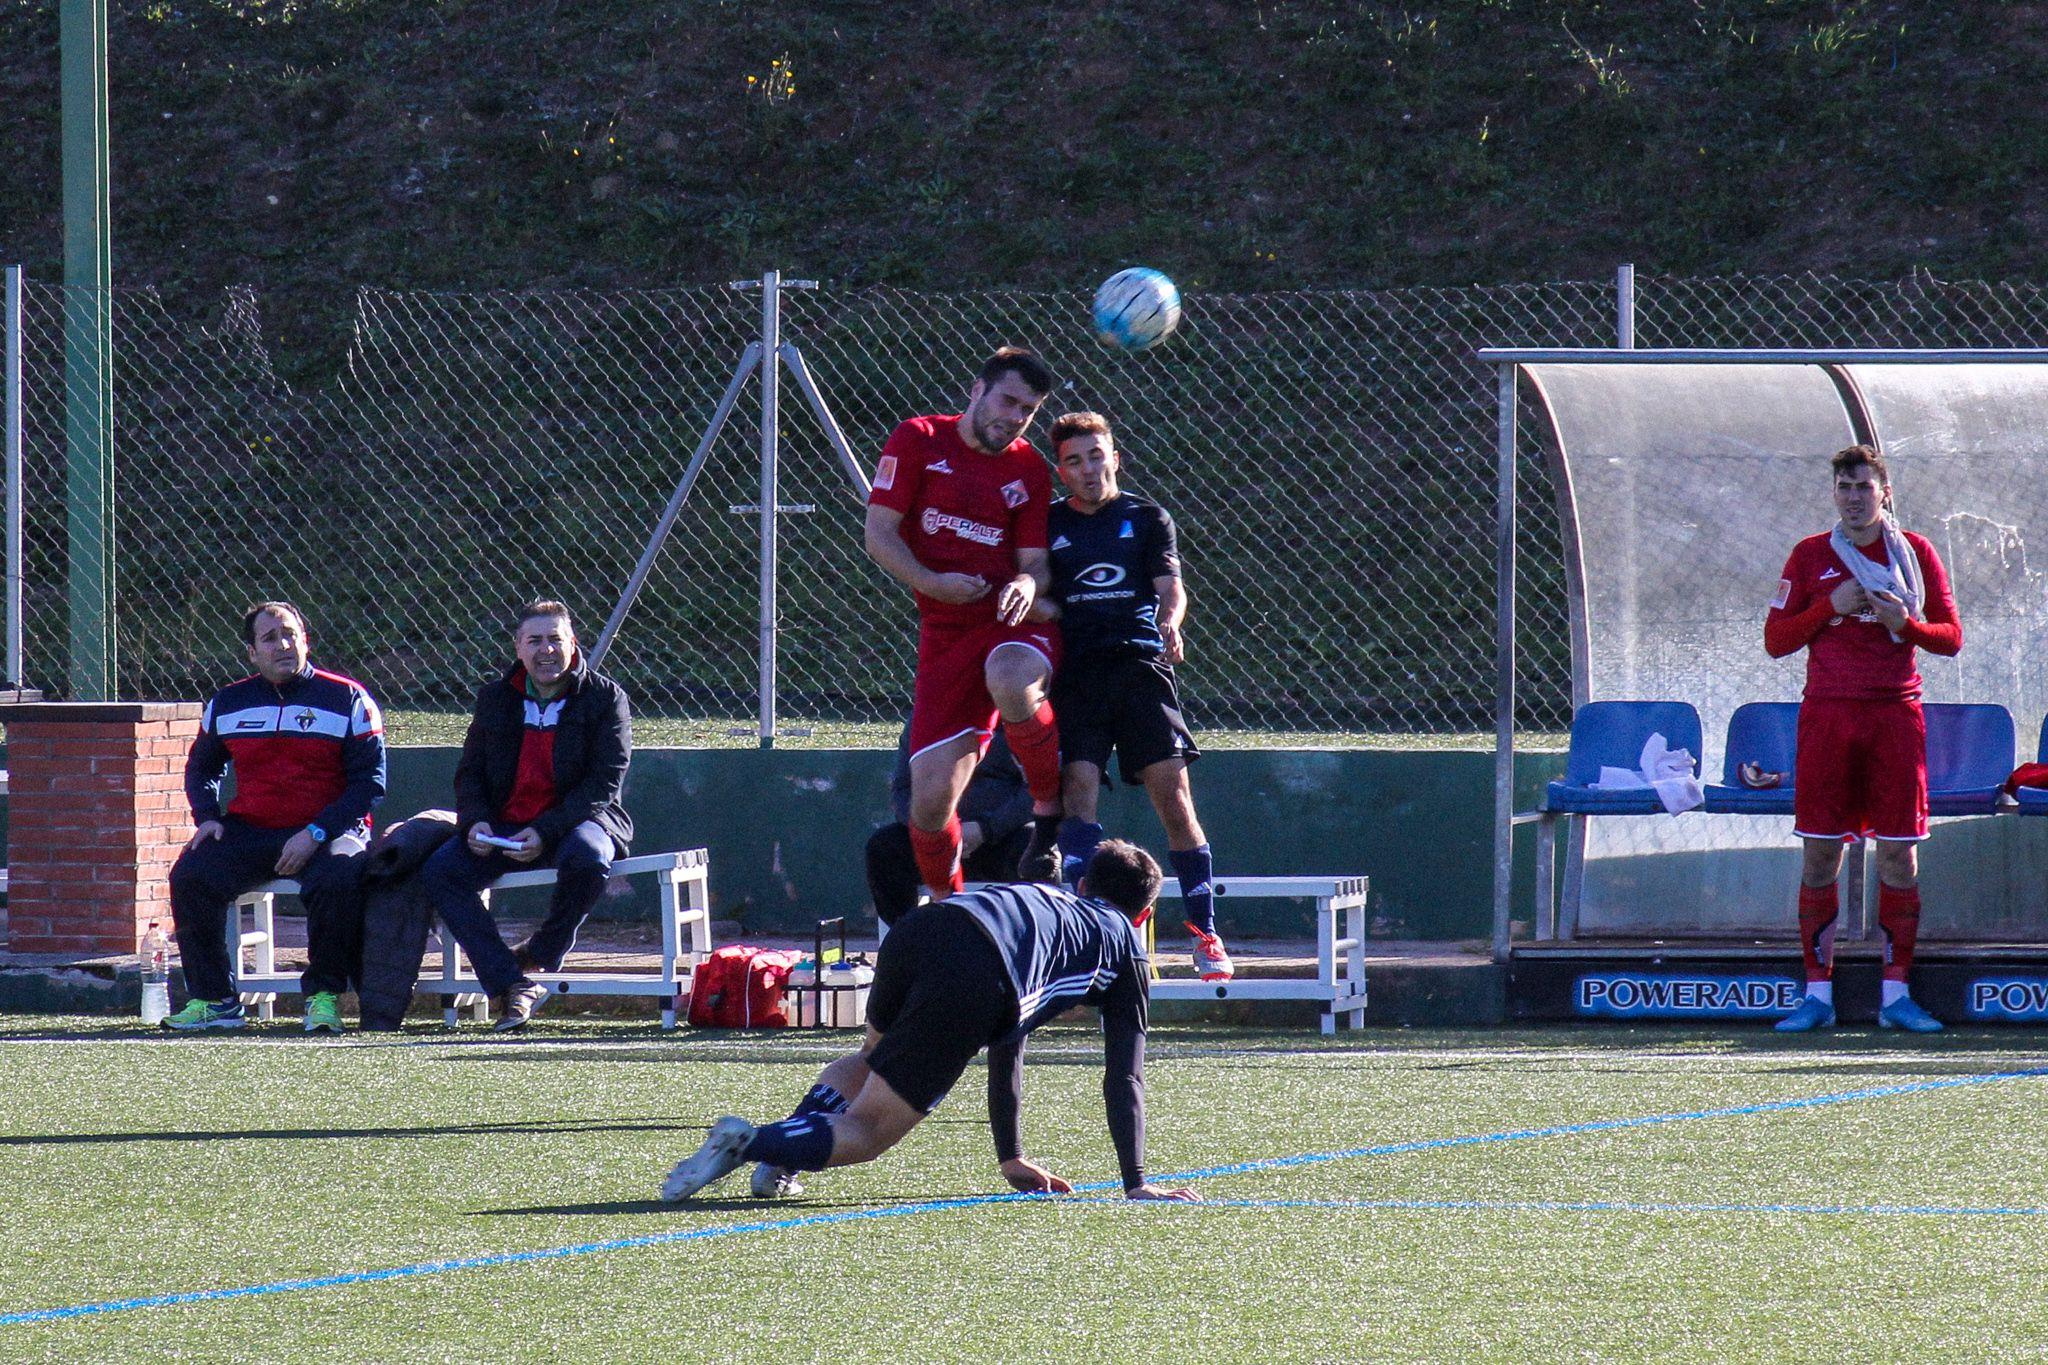 Lliga de futbol masculí. Atlètic Junior FC-CE Olivella. FOTO: Ale Gómez